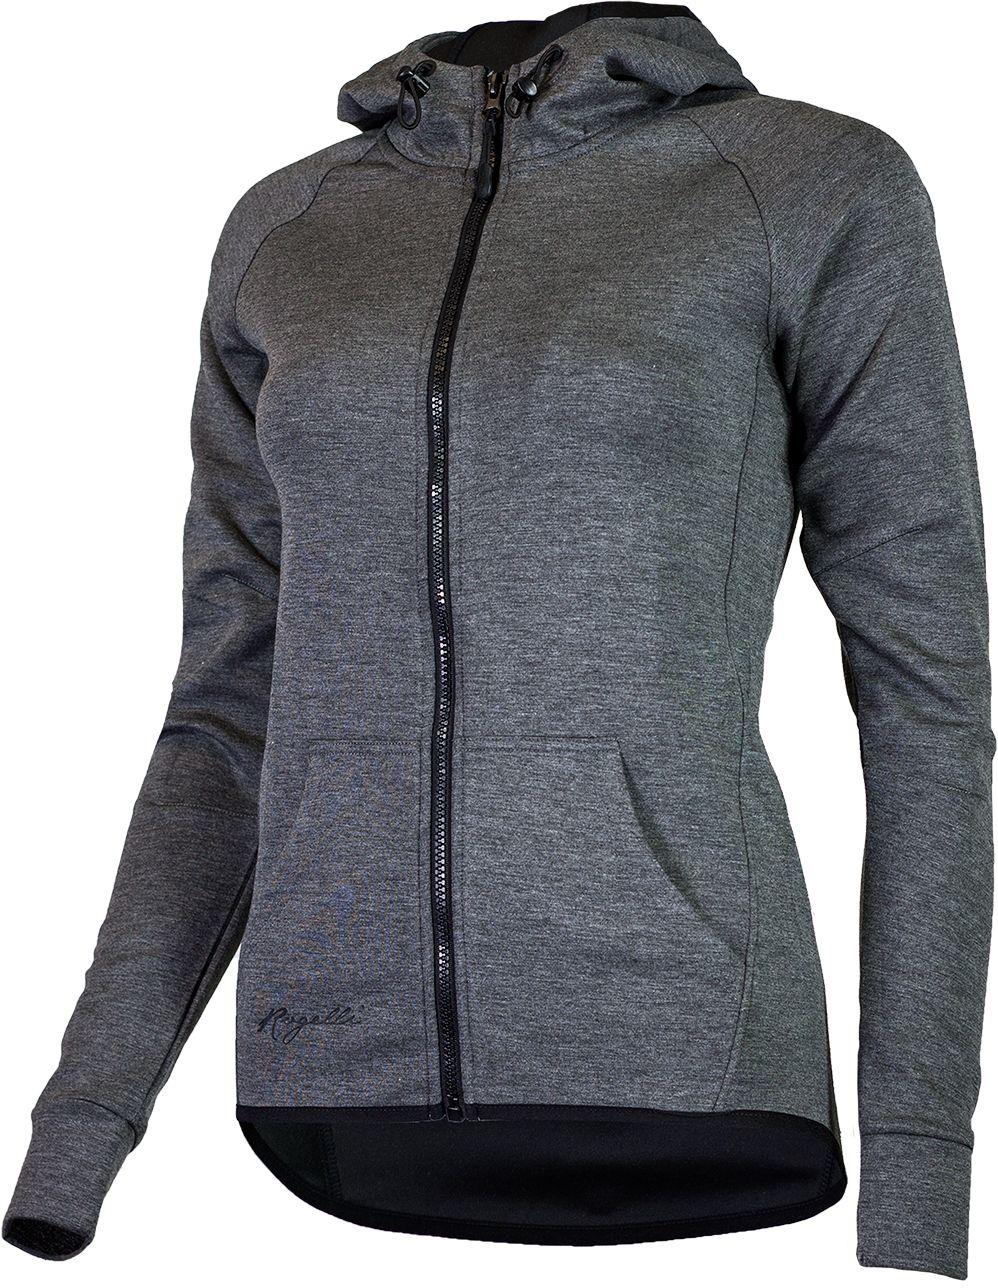 ROGELLI damska bluza z kapturem TRAINING szara Rozmiar: L,050.609.XS